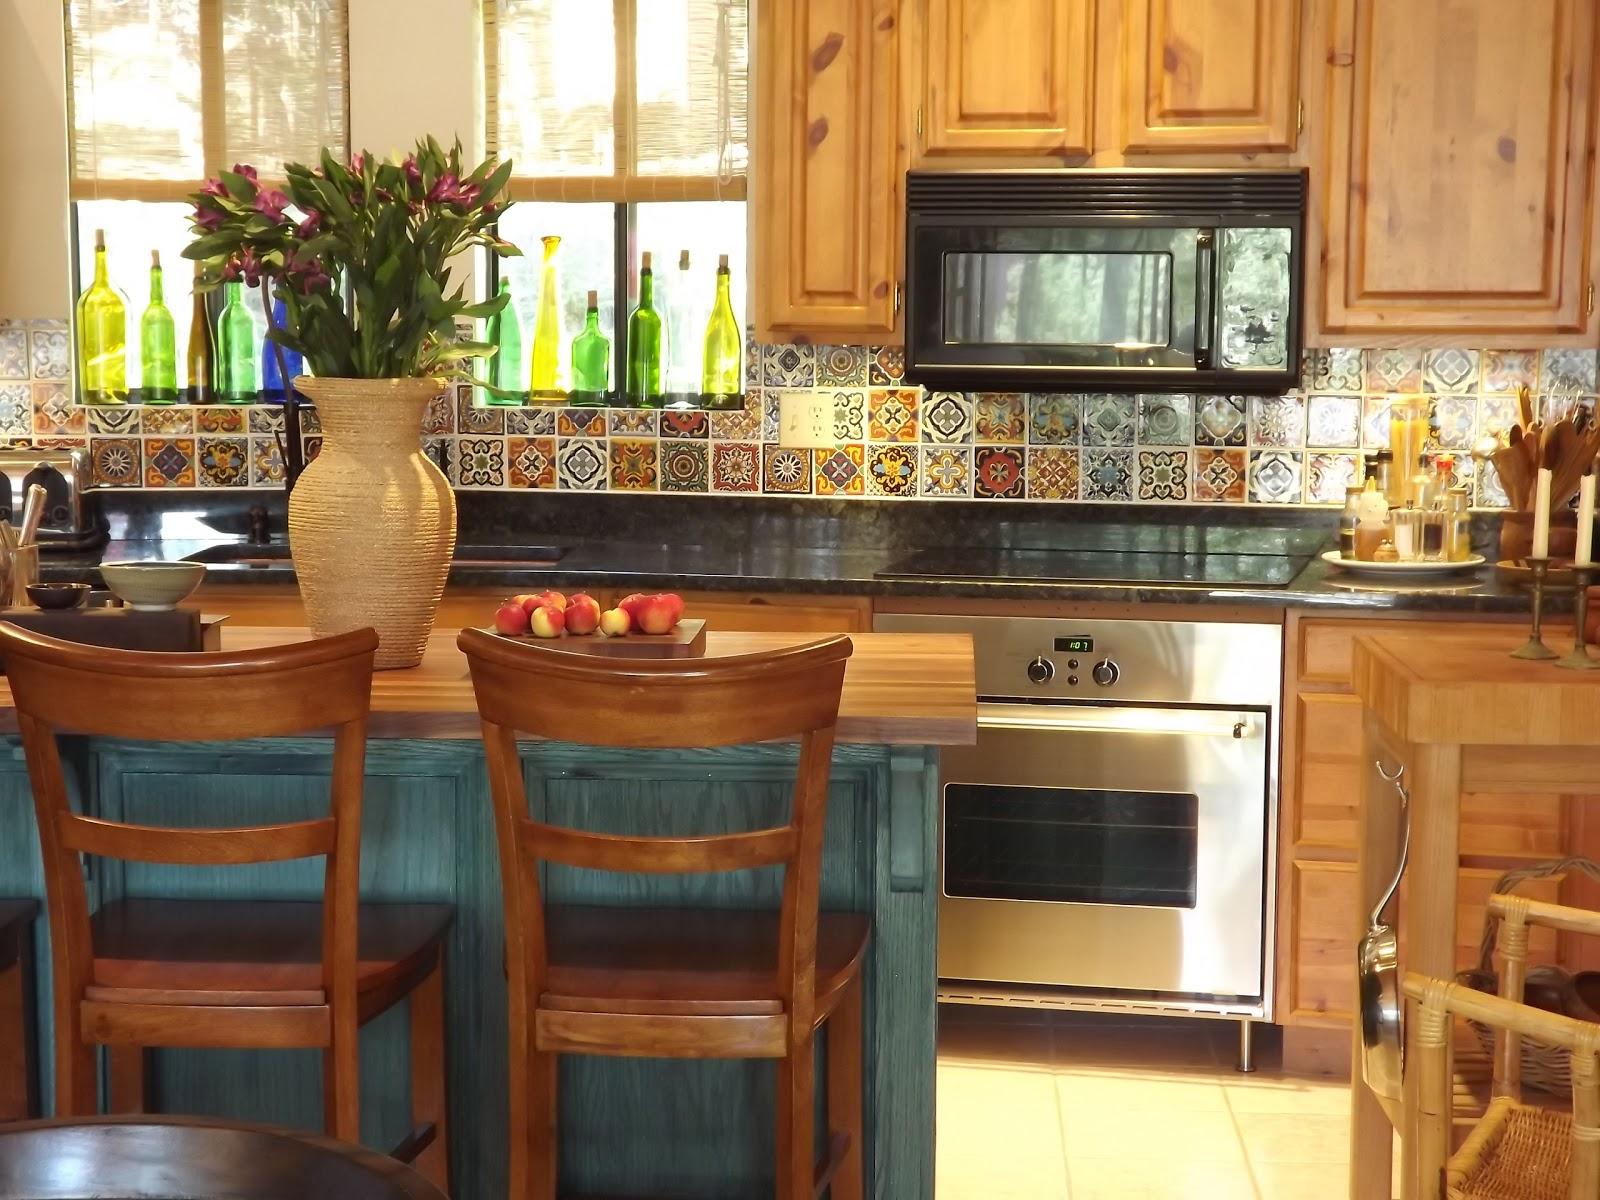 Dusty Coyote: Mexican Tile Tile backsplash DIY - Mexican Tile Kitchen Backsplash